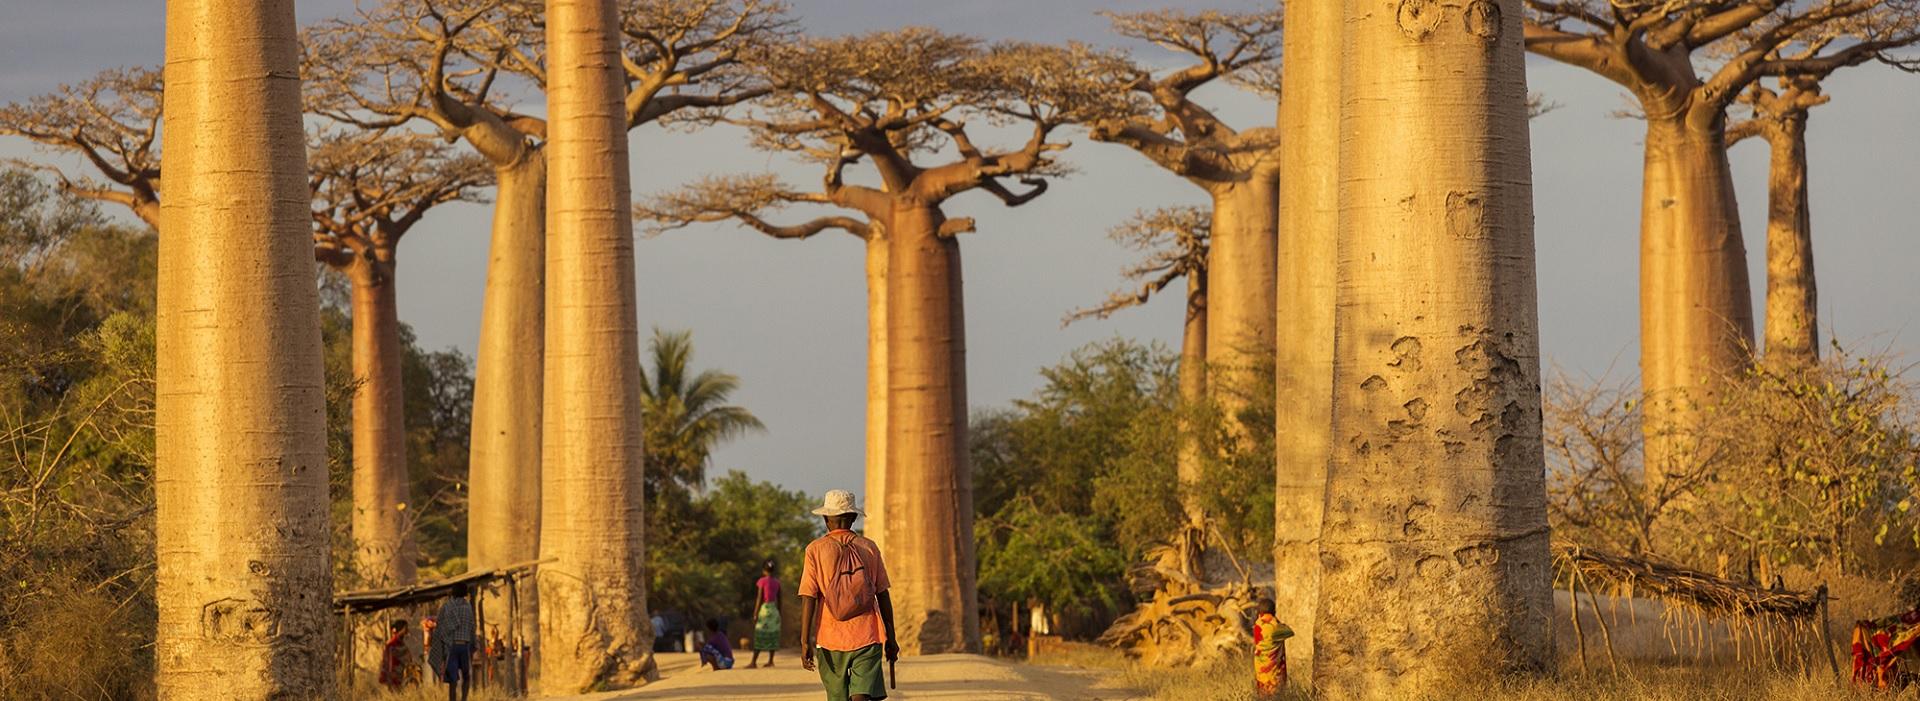 Pasipaoro Malagasy